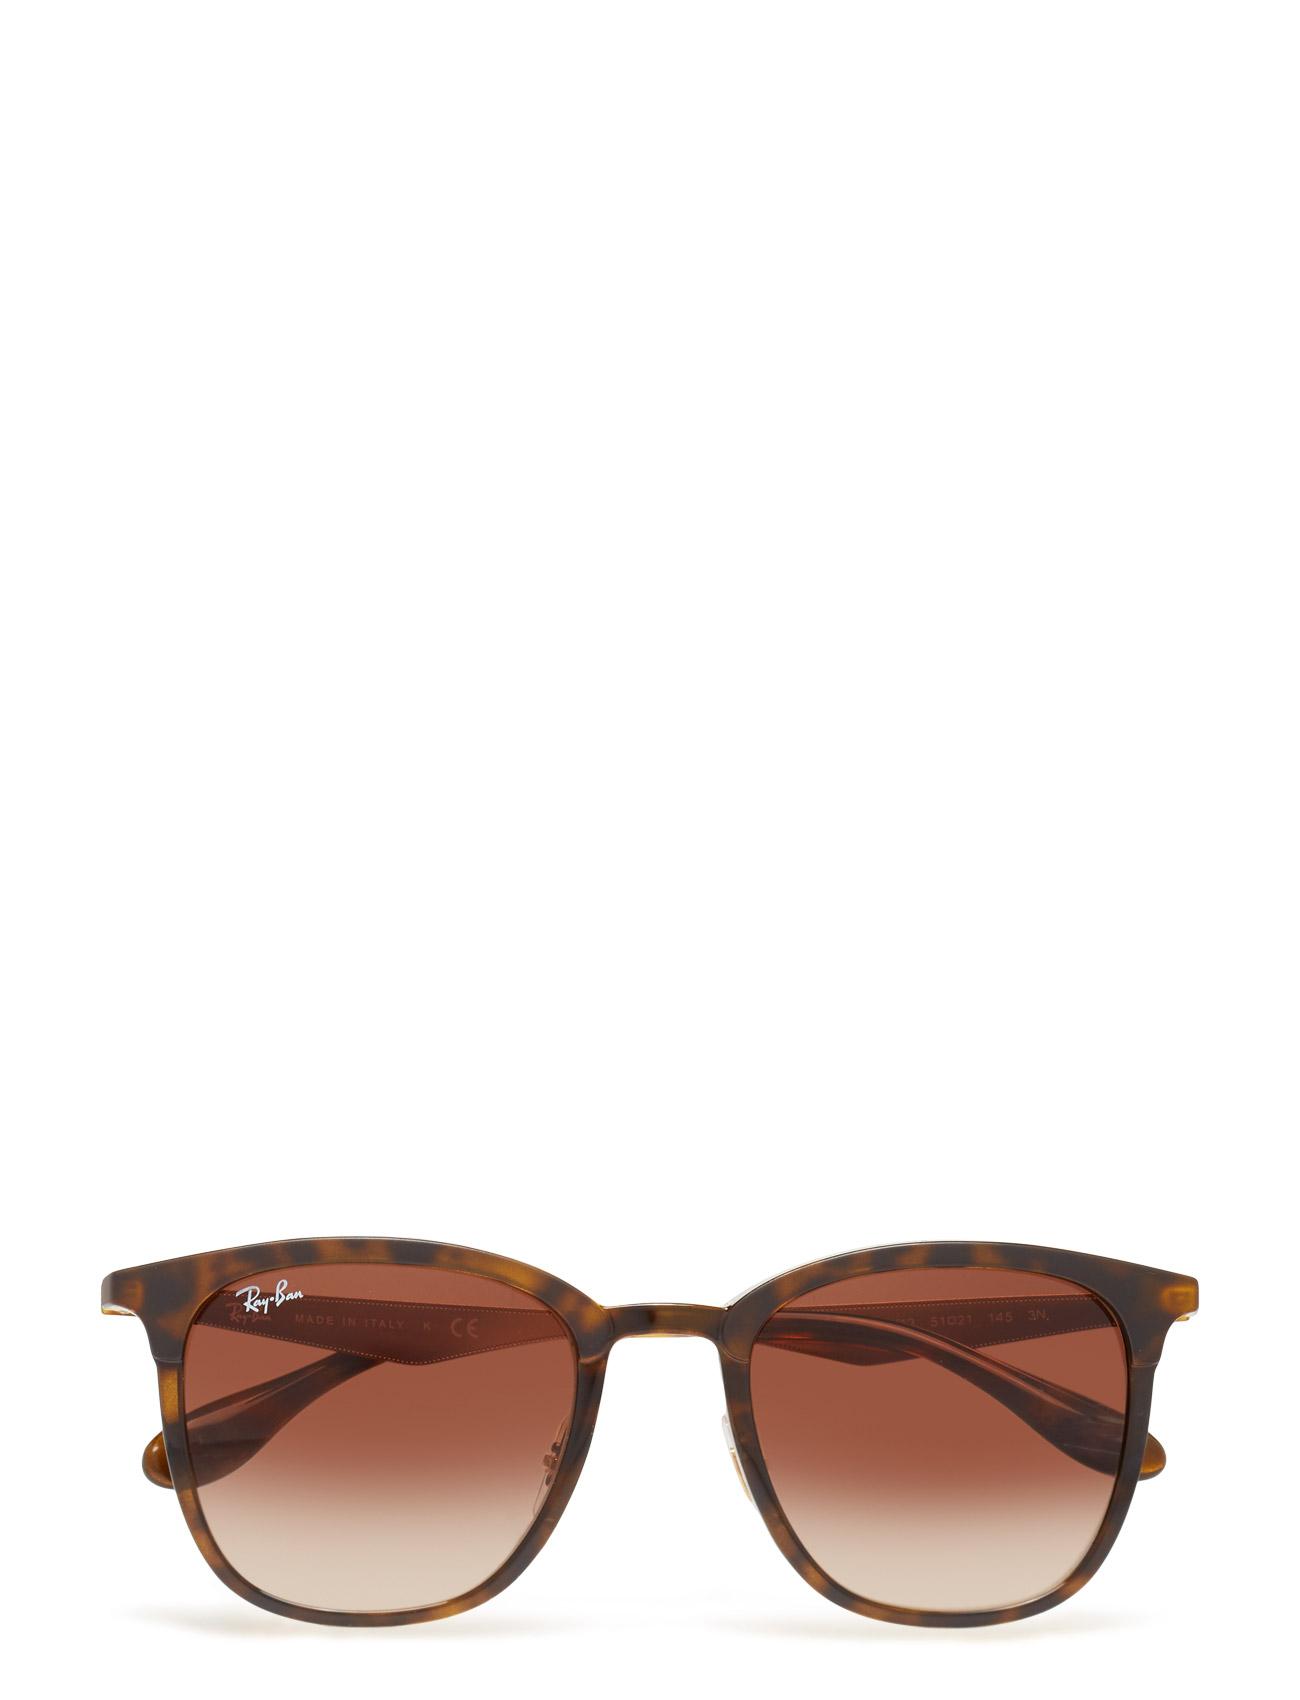 90fac11867e8 0rb4278 wayfarer solbriller fra Ray-Ban til herre i HAVANA MATTE ...